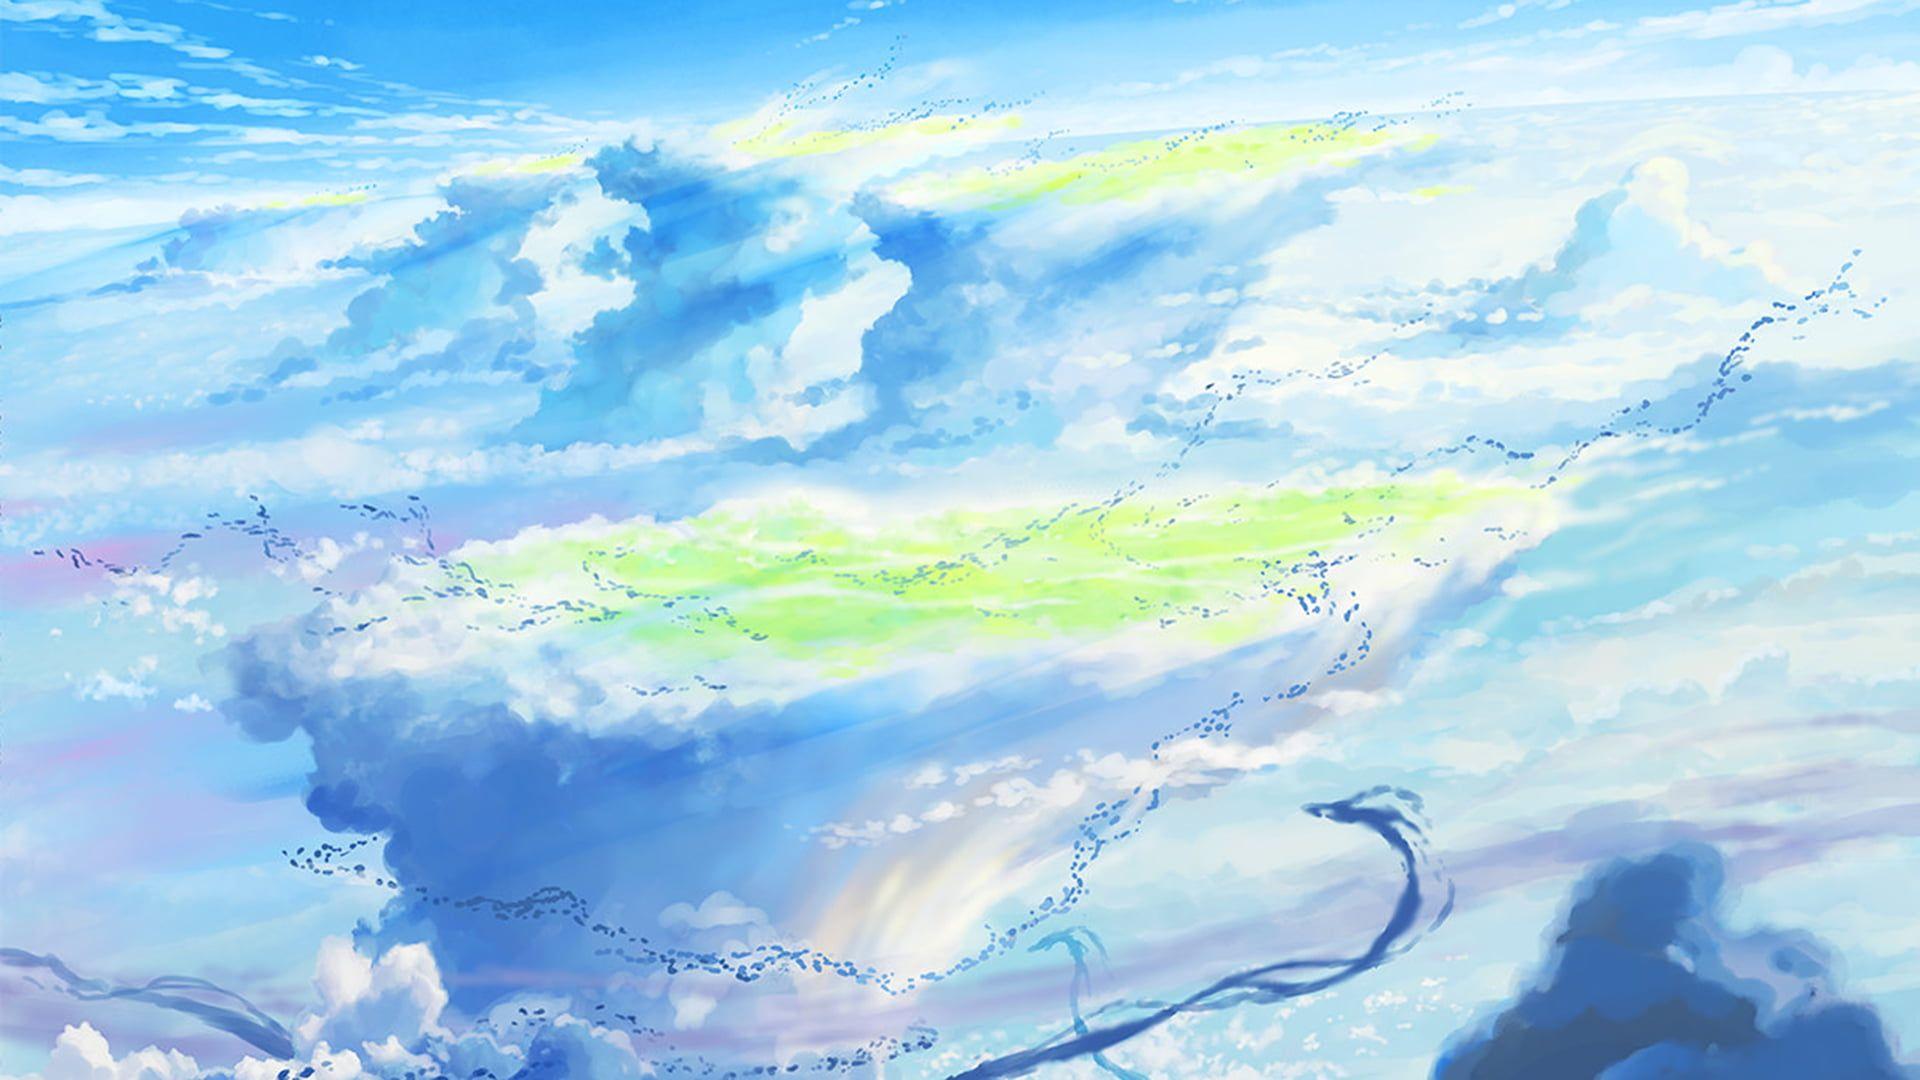 Weathering With You Makoto Shinkai anime blue sky